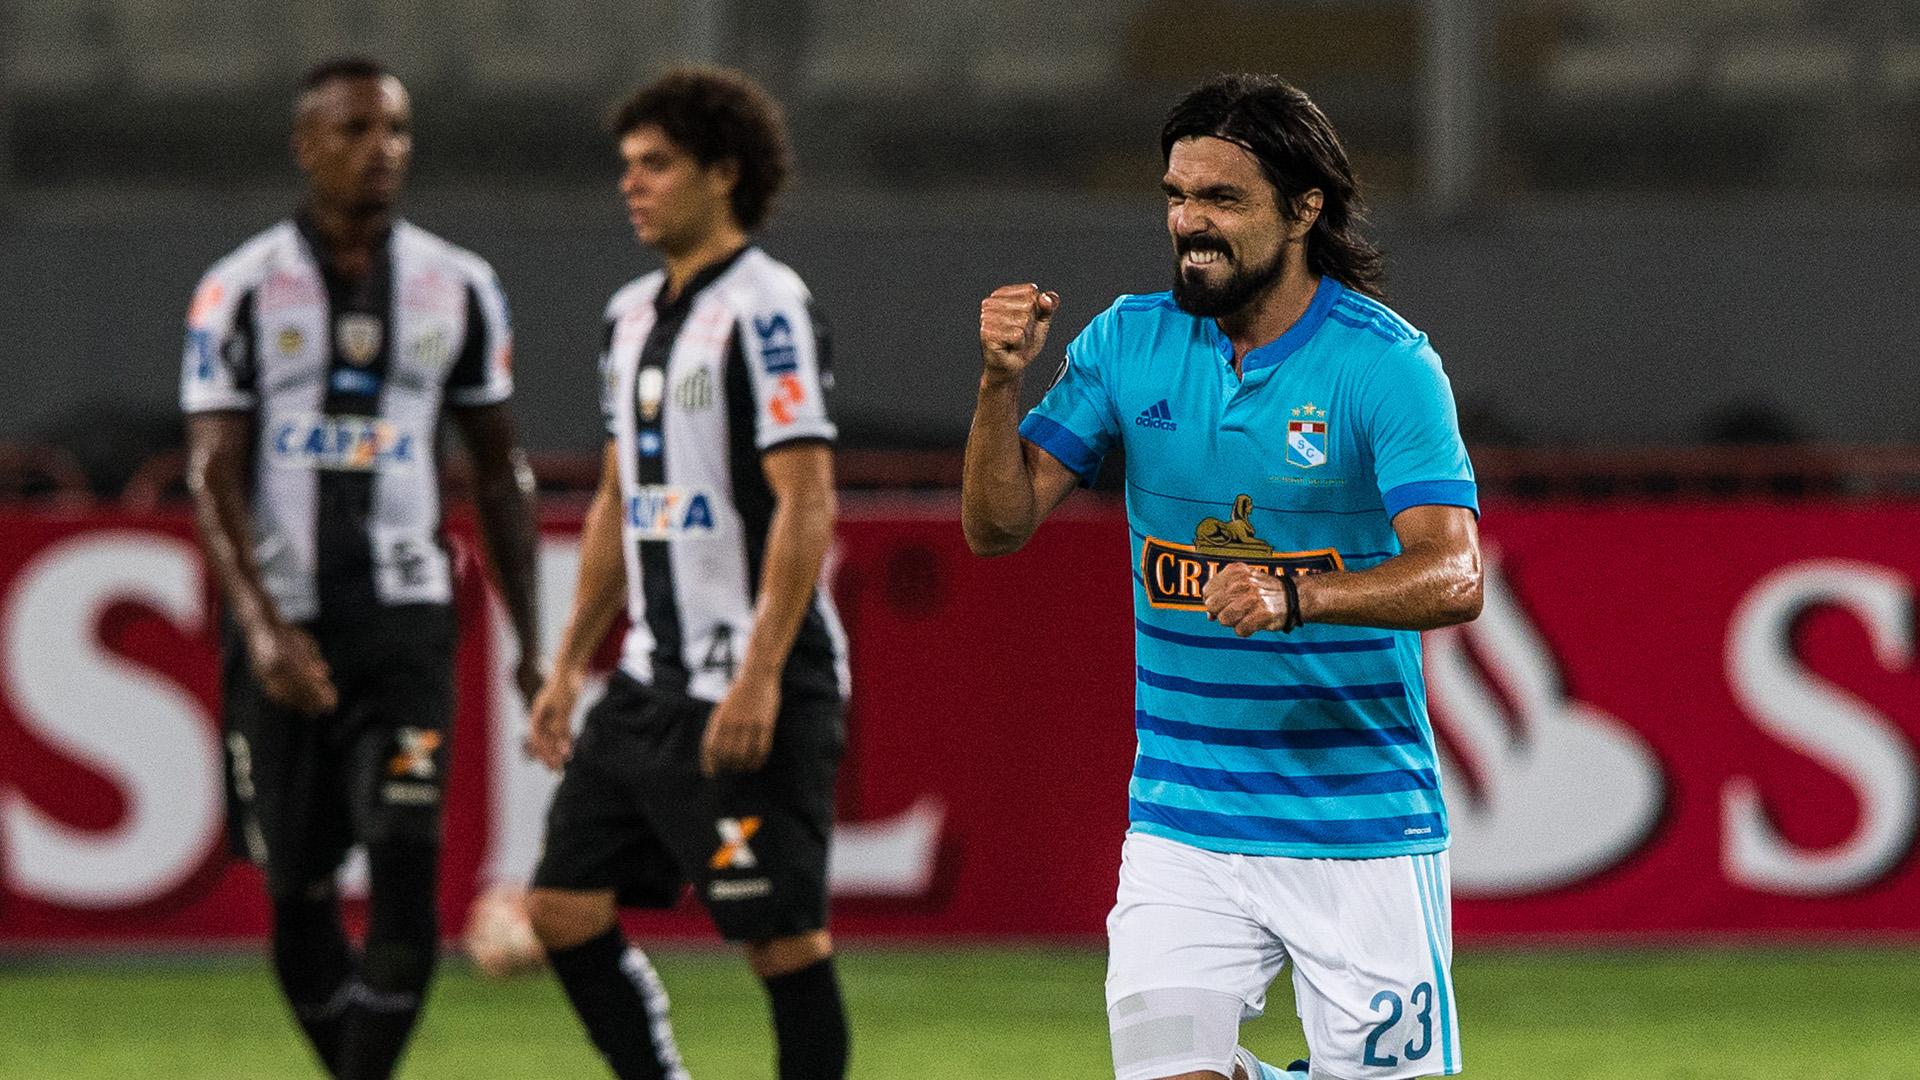 Jorge Cazulo Sporting Cristal Santos Copa Libertadores 09032017